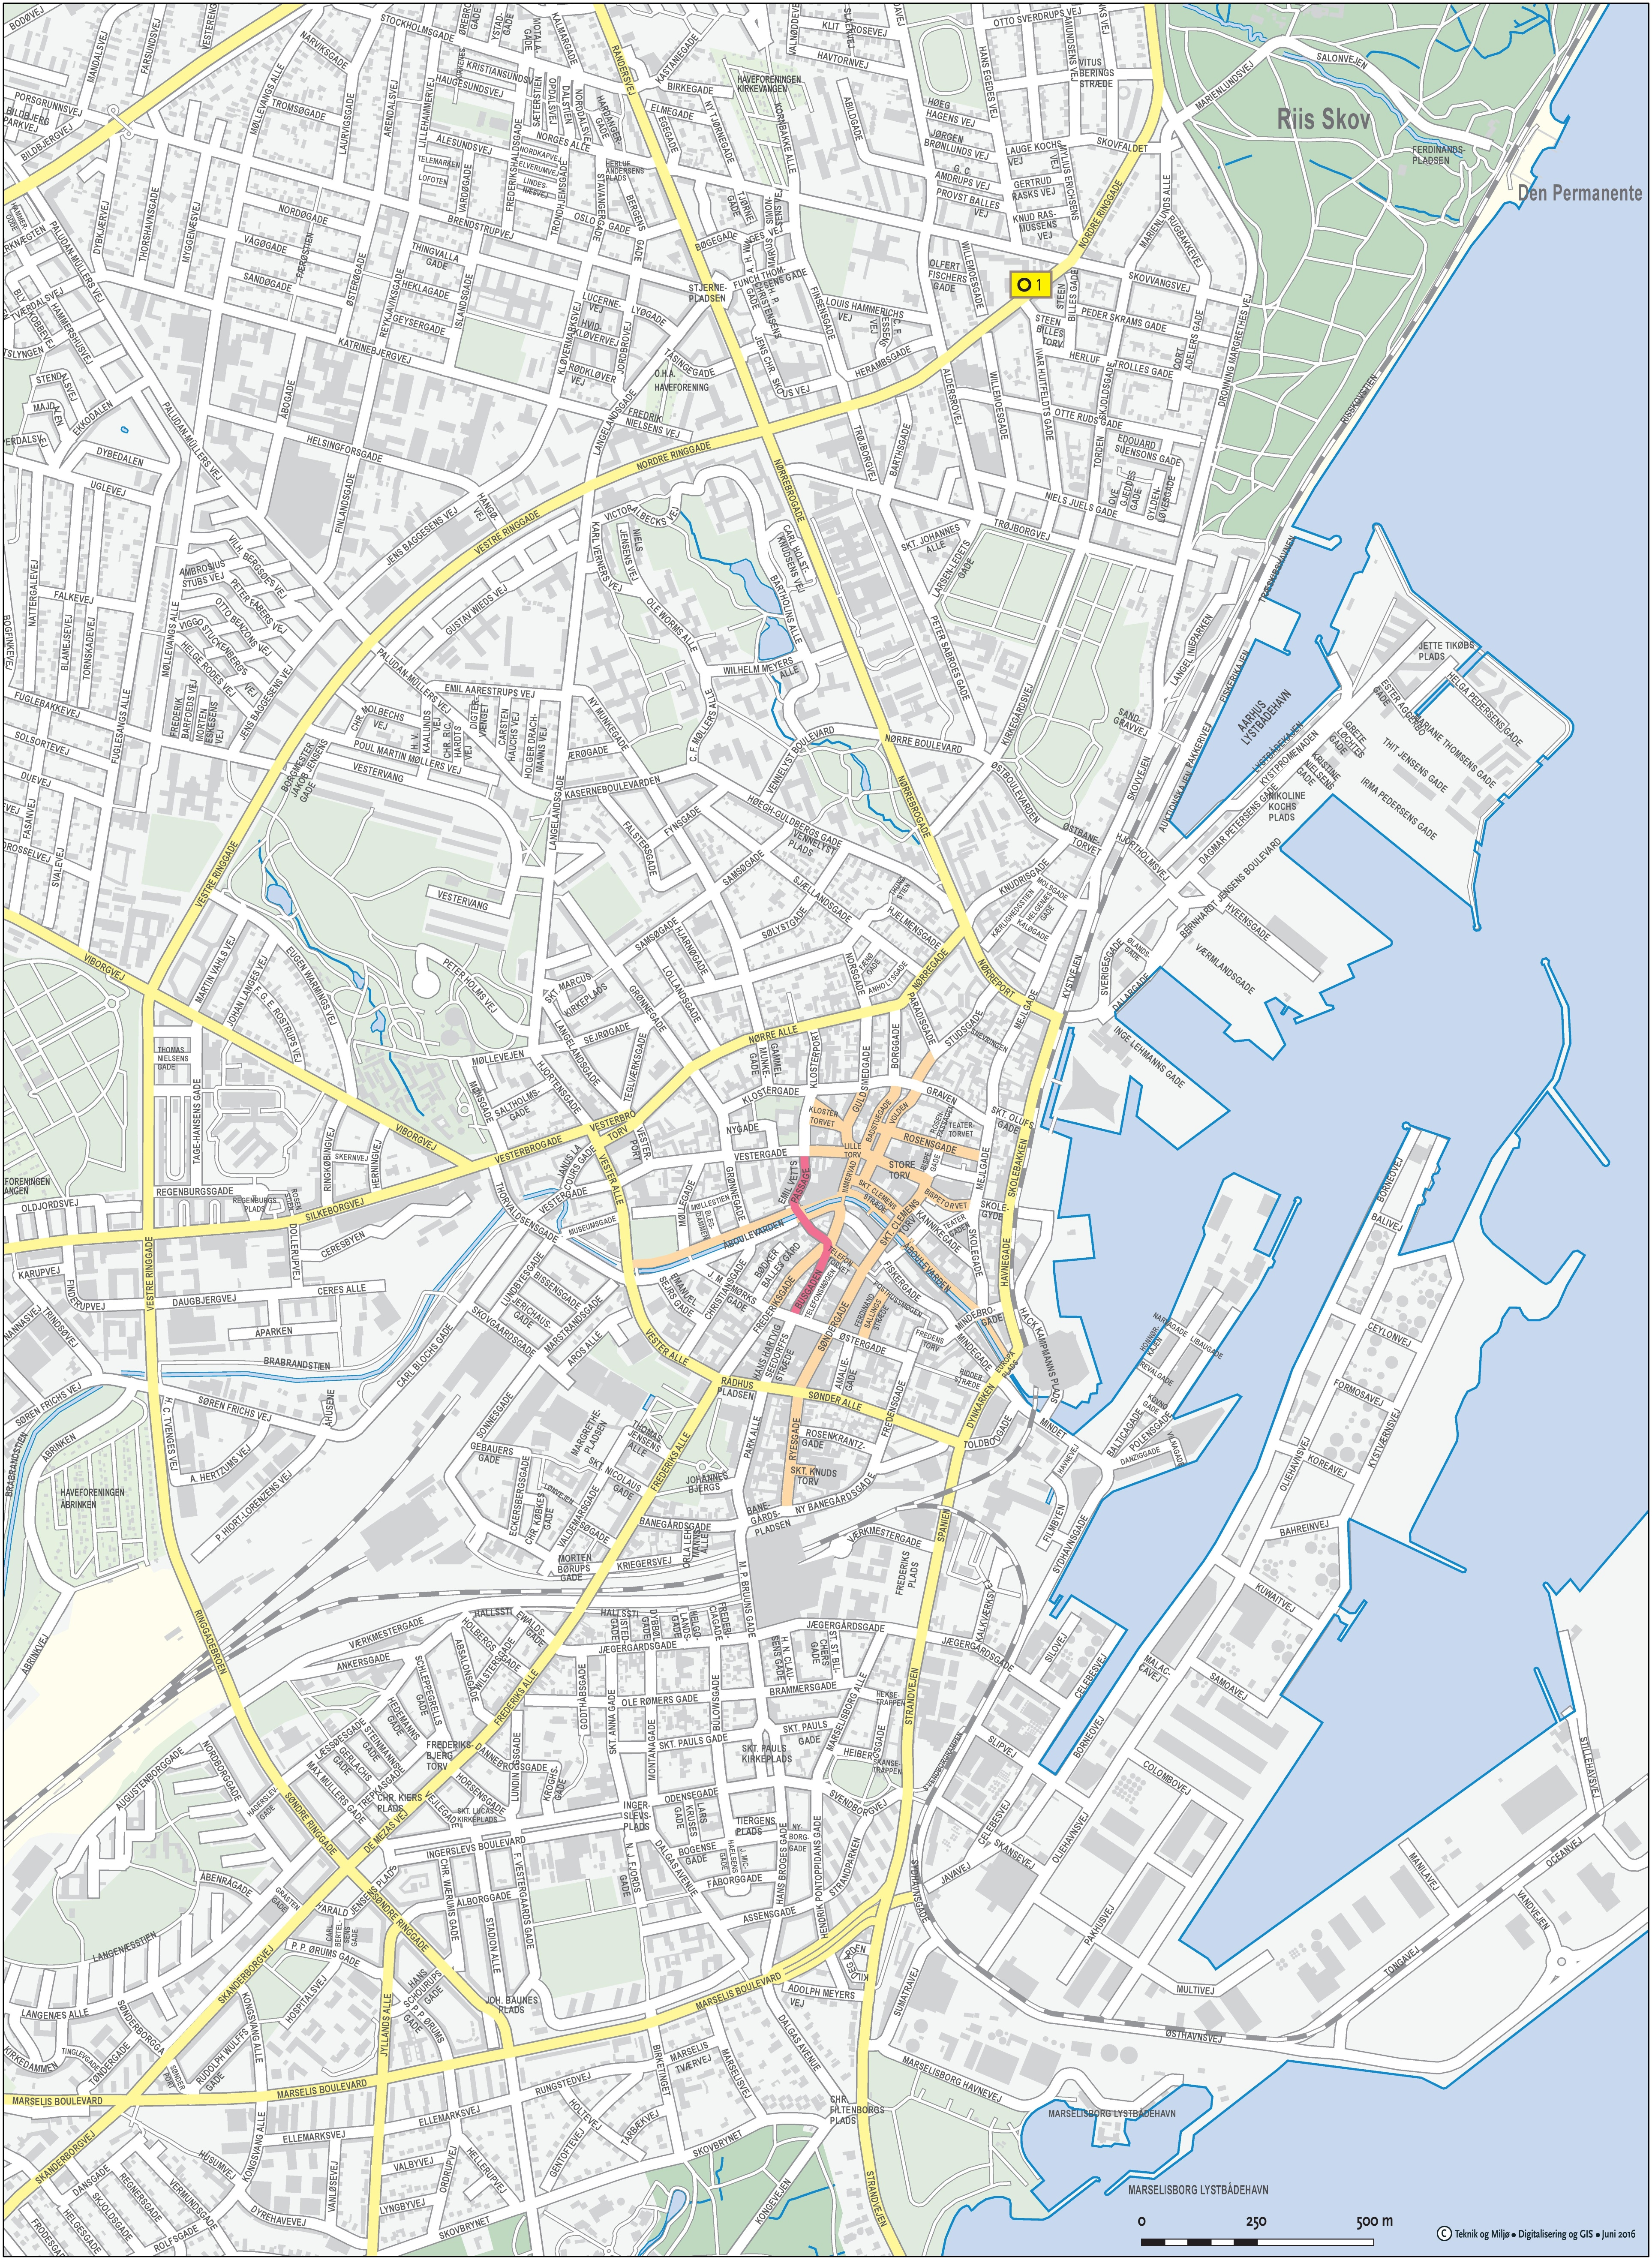 Aarhus city center map